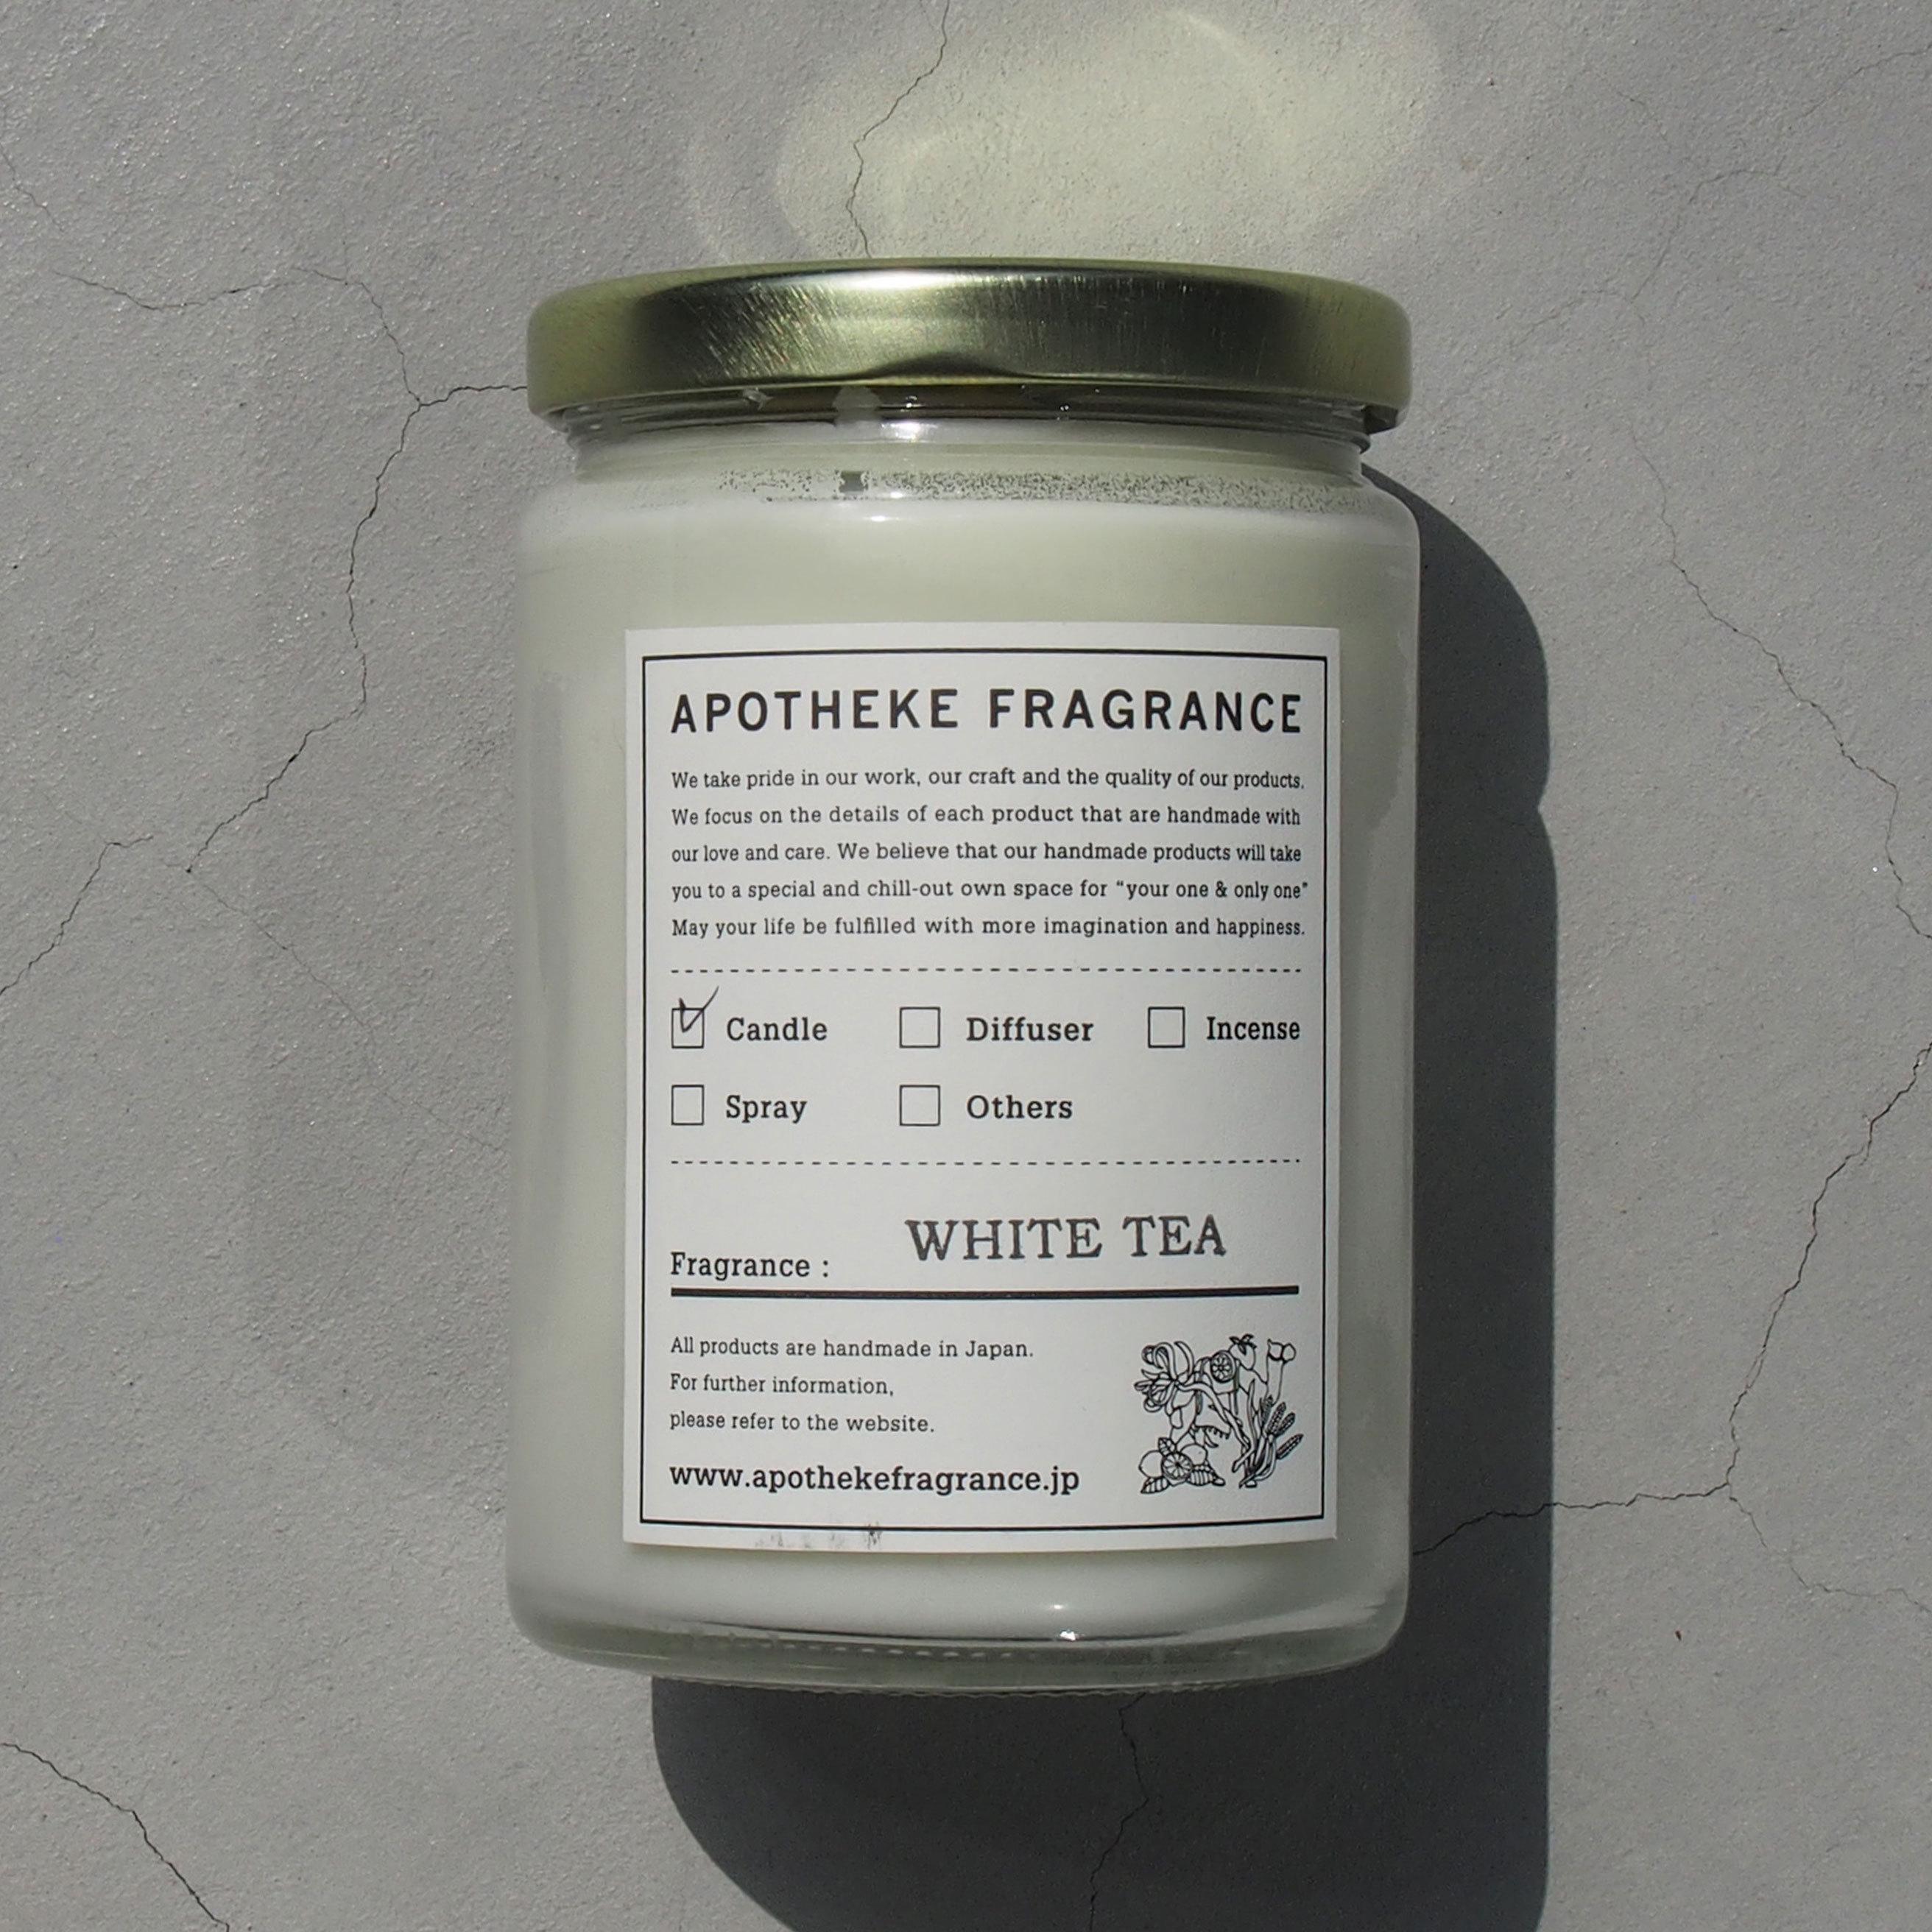 APOTHEKE FRAGRANCE GLASS JAR CANDLE